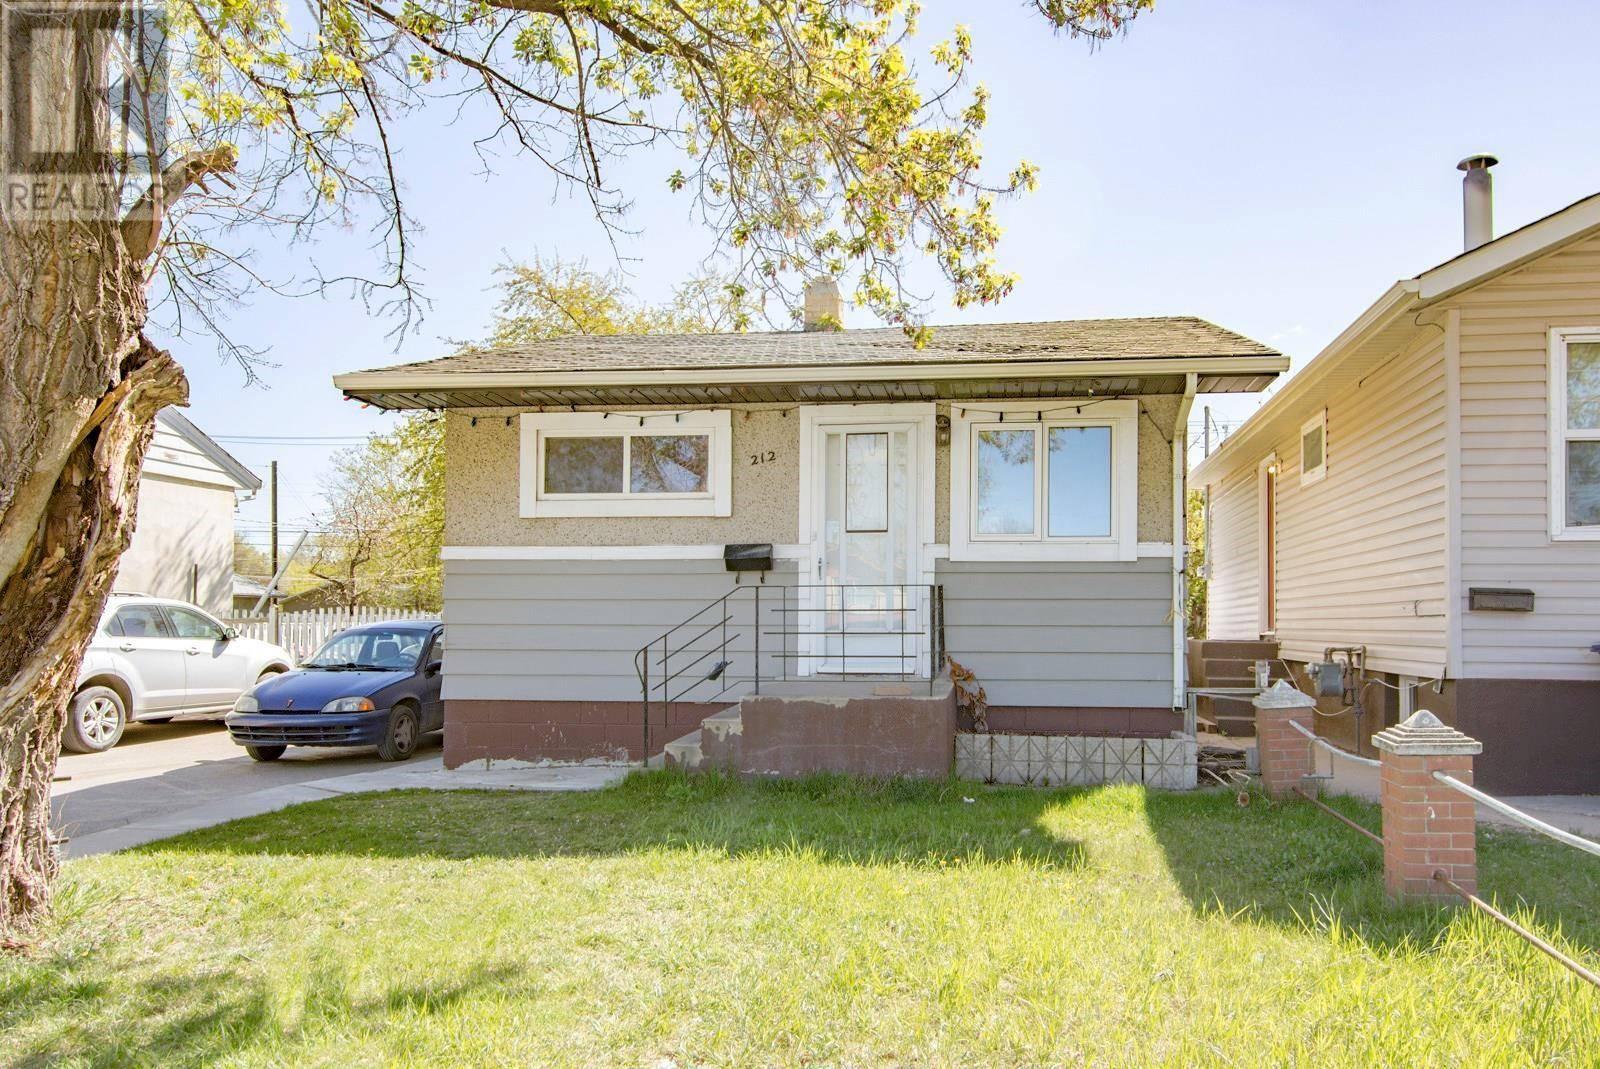 House for sale at 212 W Ave S Saskatoon Saskatchewan - MLS: SK784523